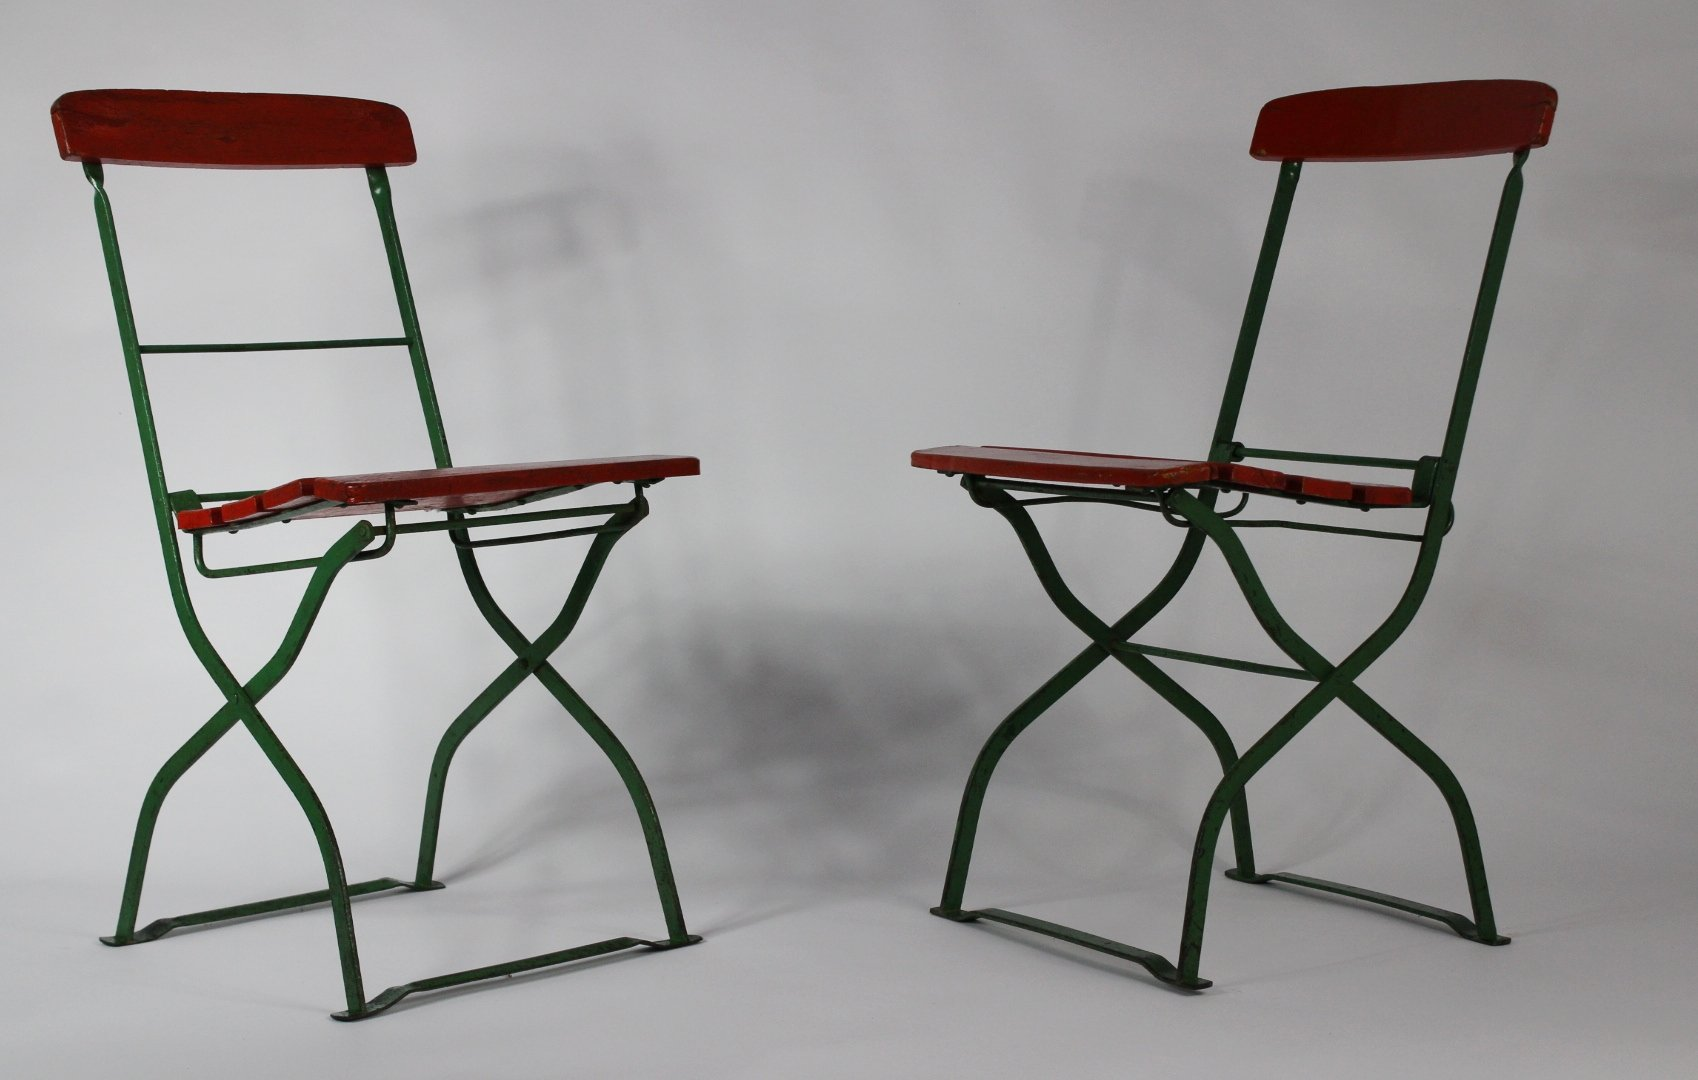 Vintage french folding garden chairs 1930s set of 2 en for Garden design 1930